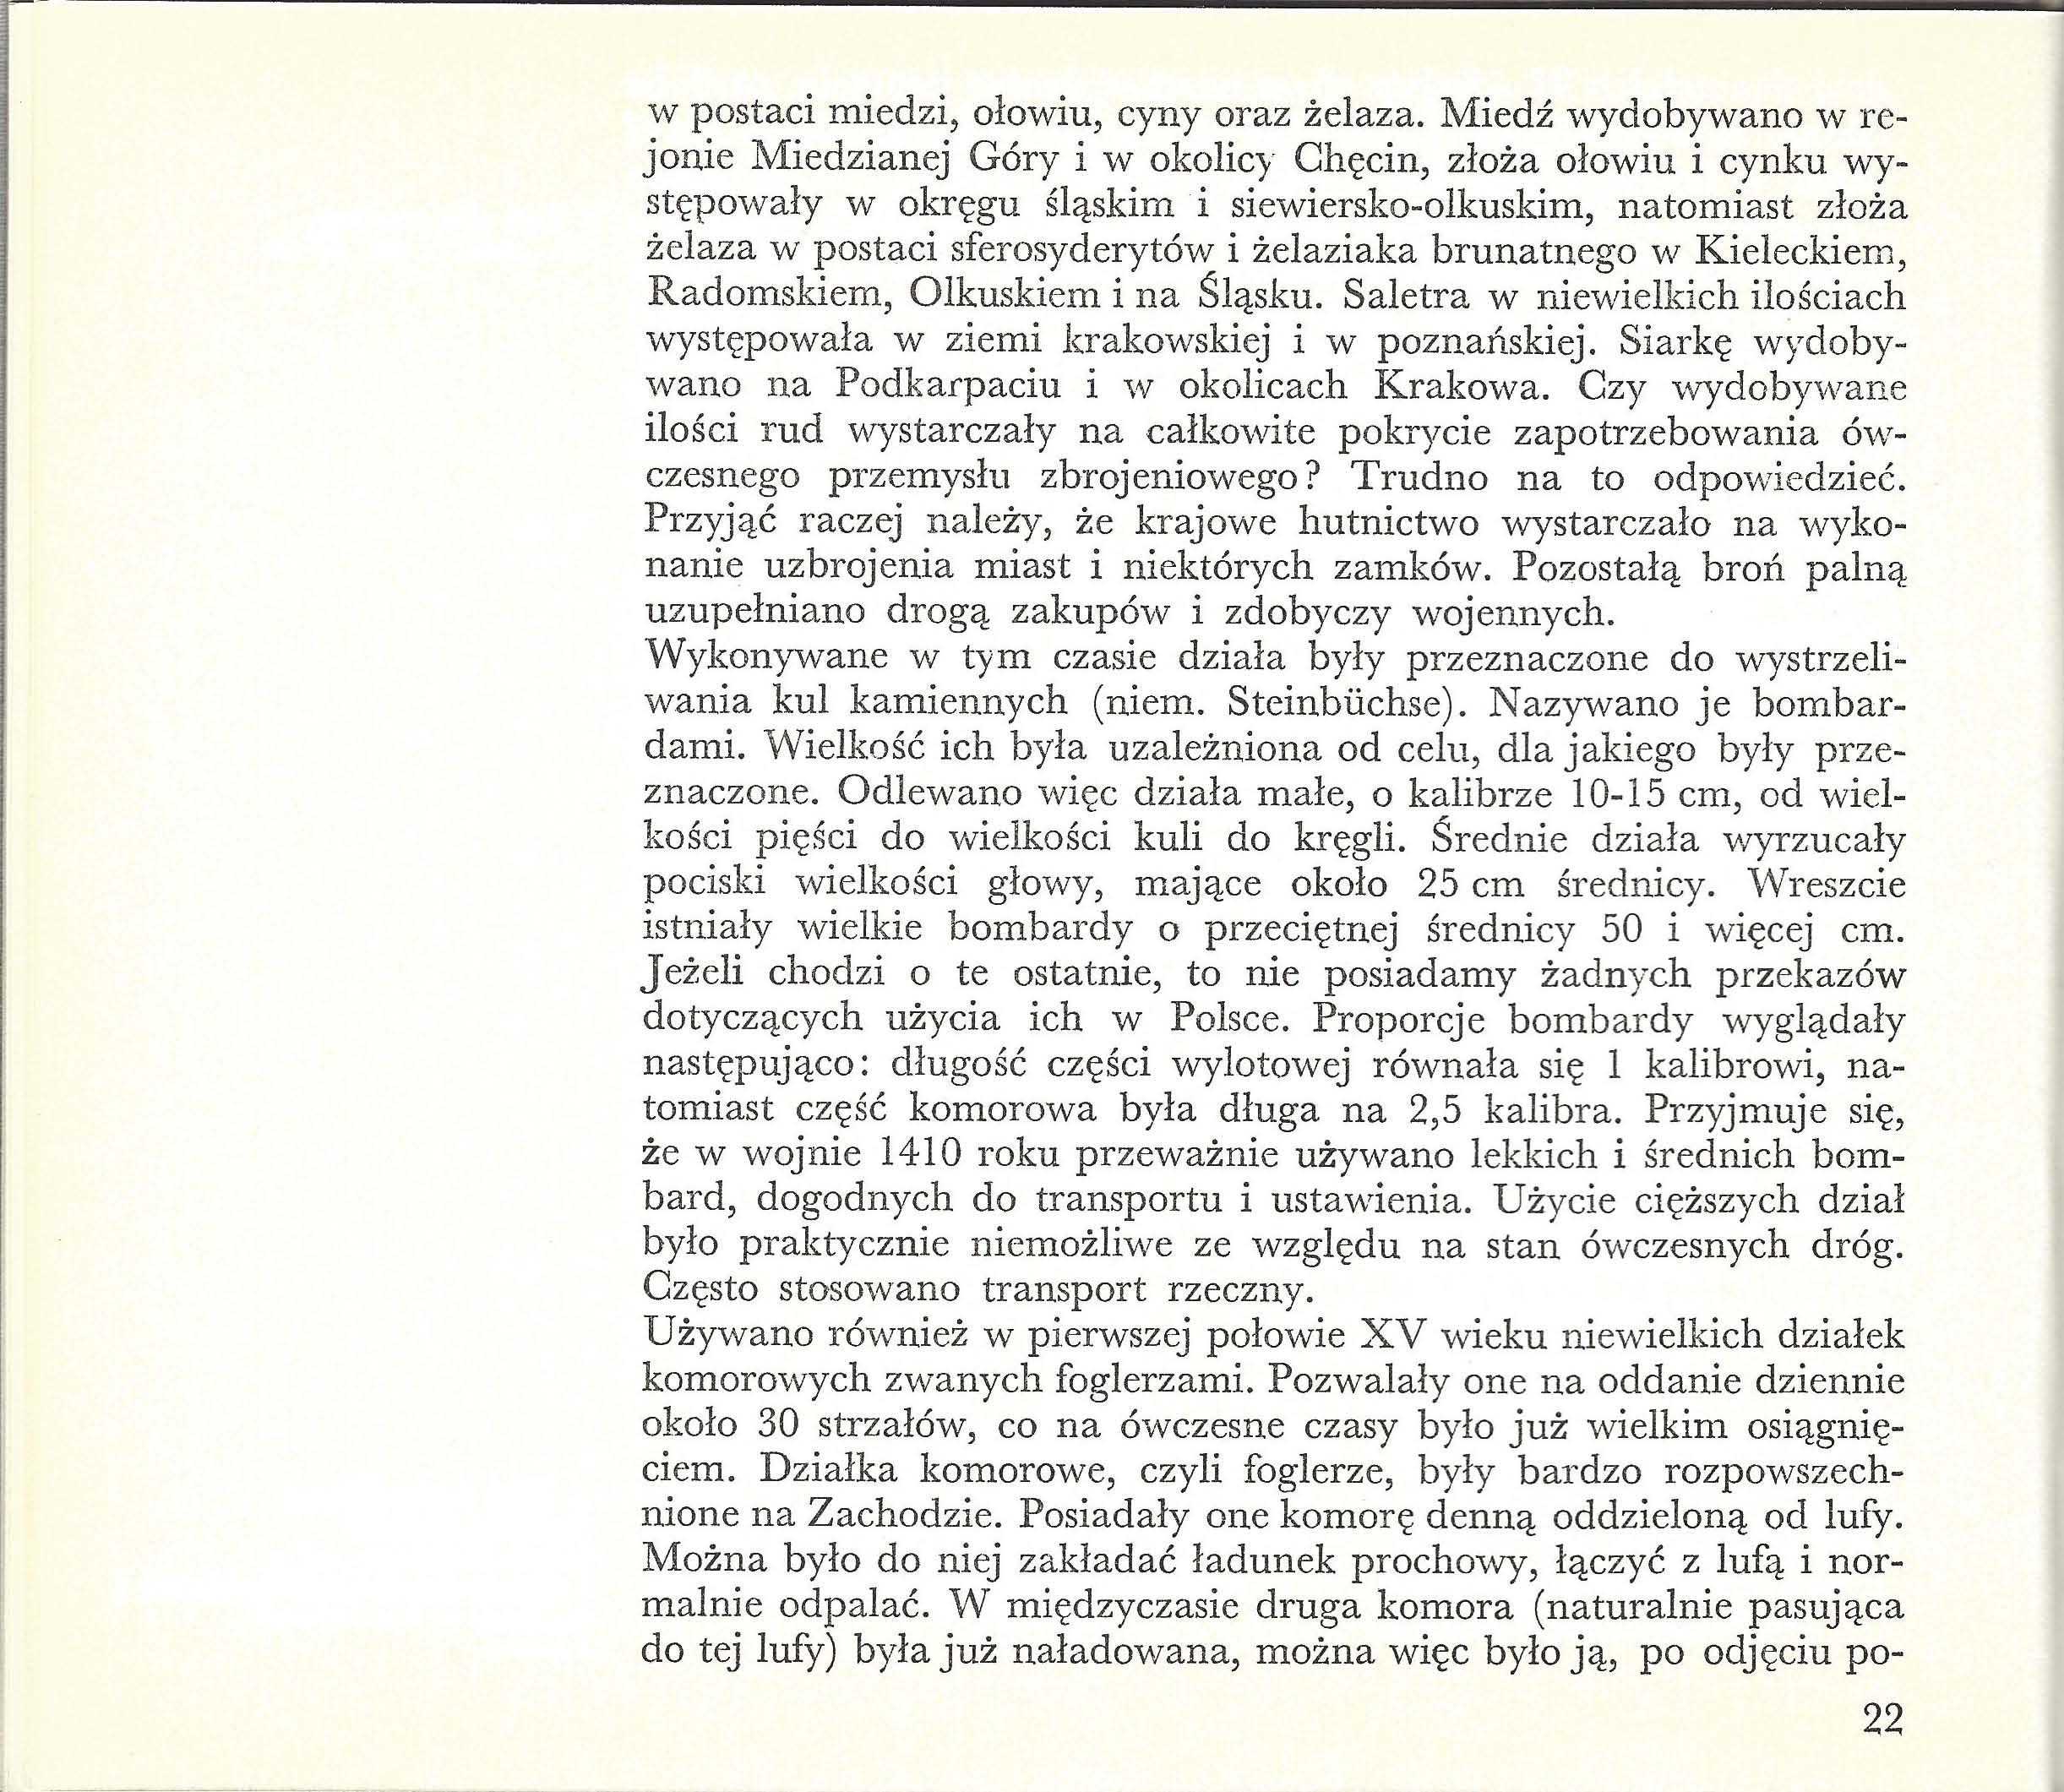 polska.bron.palna.kobielski15-23_Strona_6